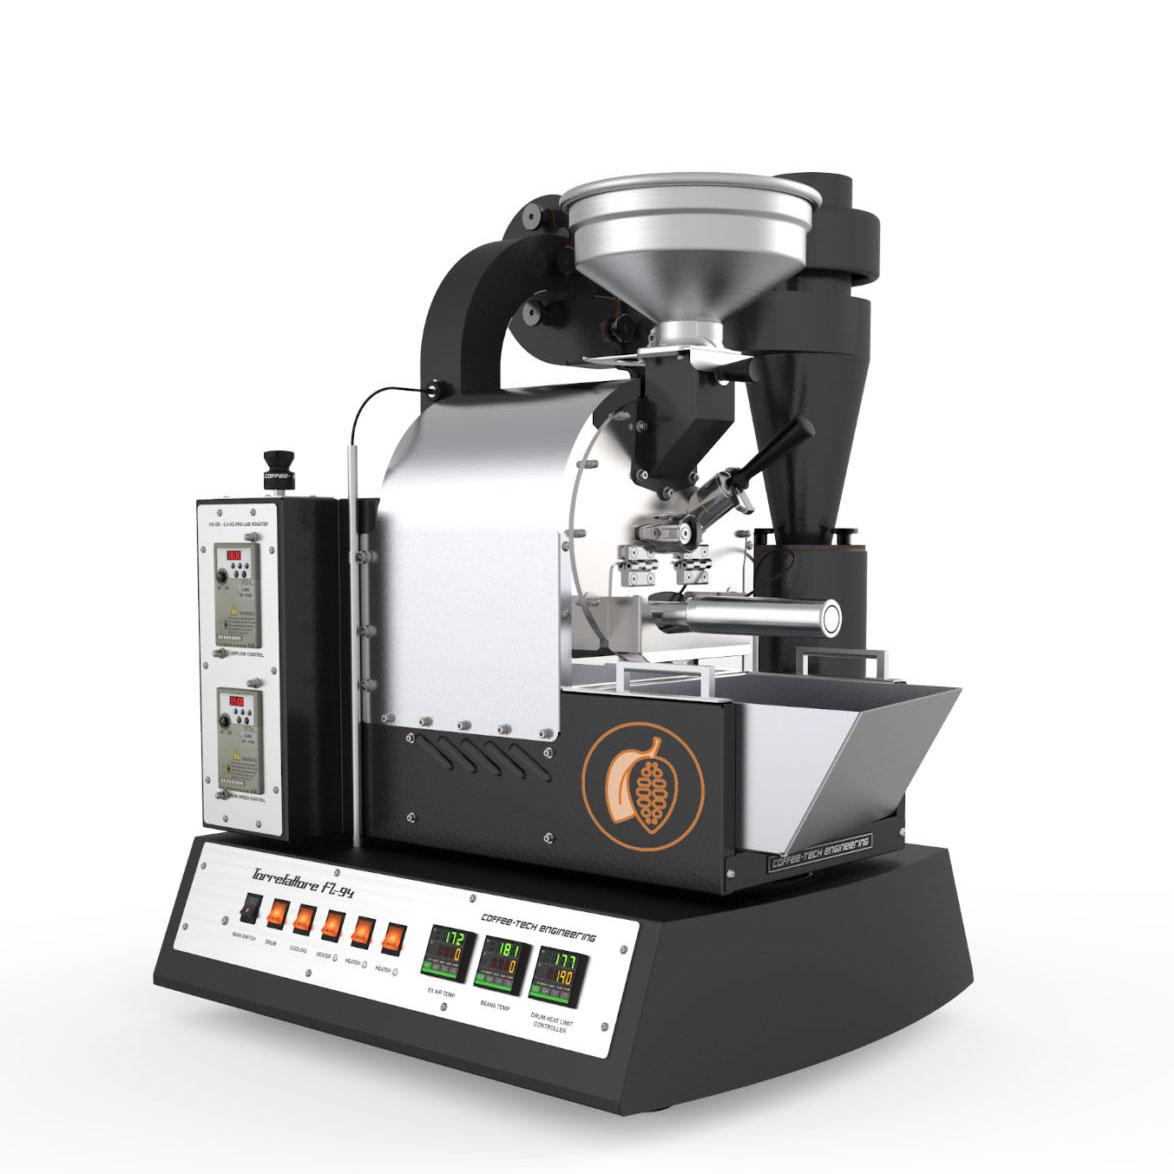 FZ94 Pro-Lab Cacao (Cocoa) Roaster